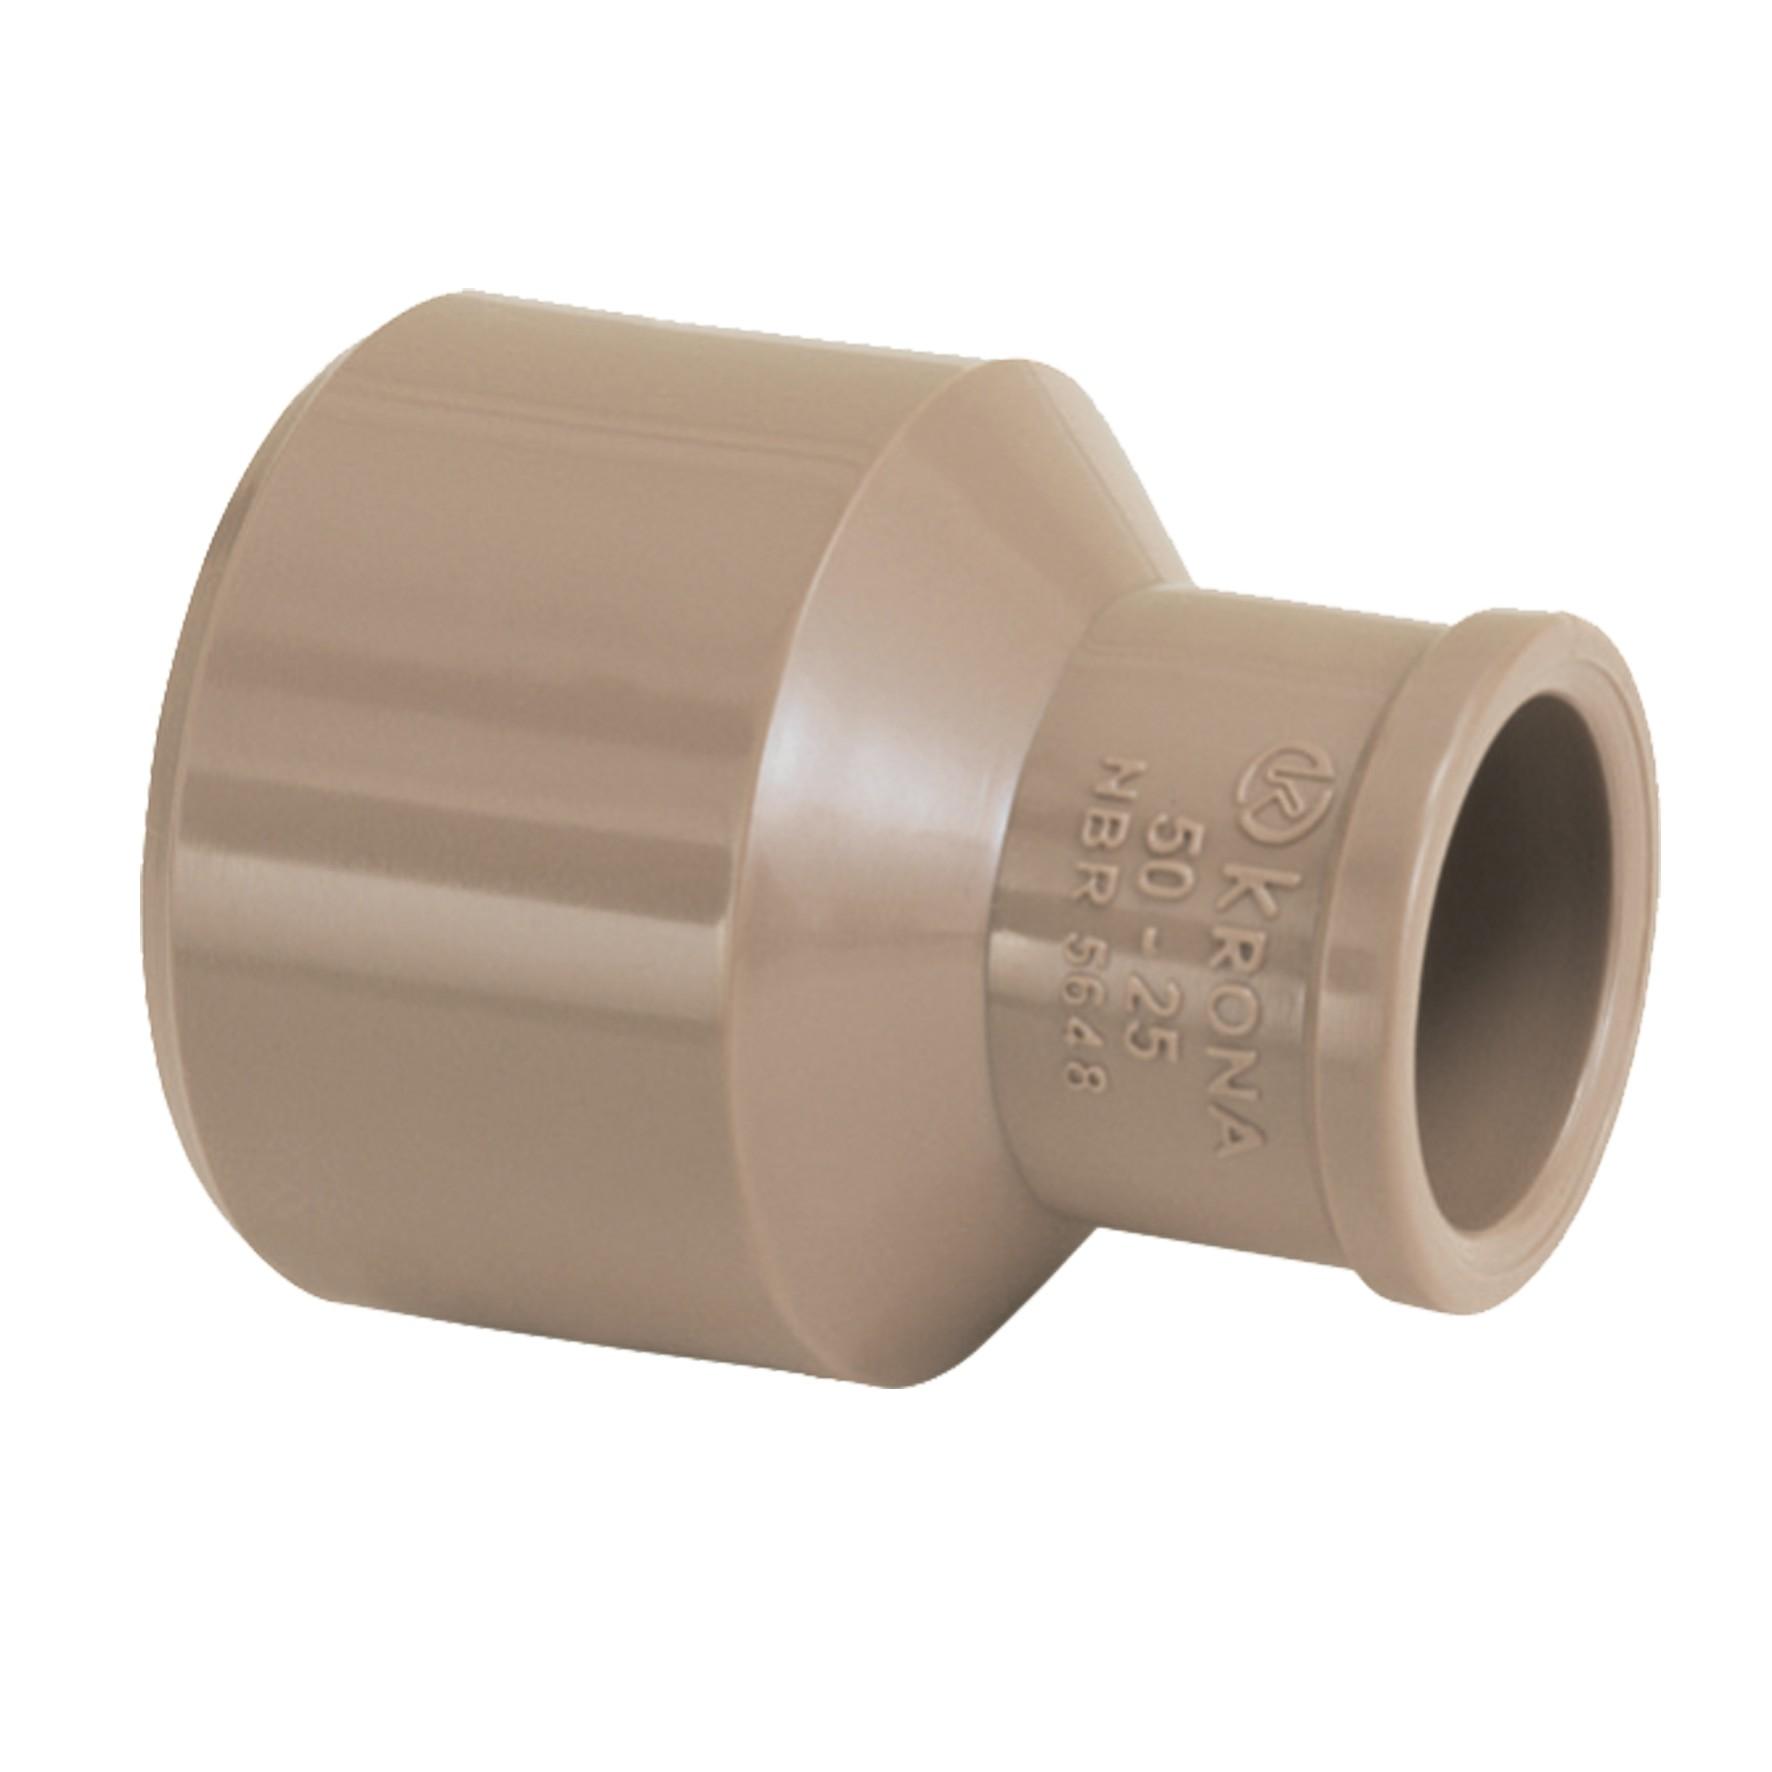 Bucha Longa Simples Soldavel de PVC 60mm 374 - Krona